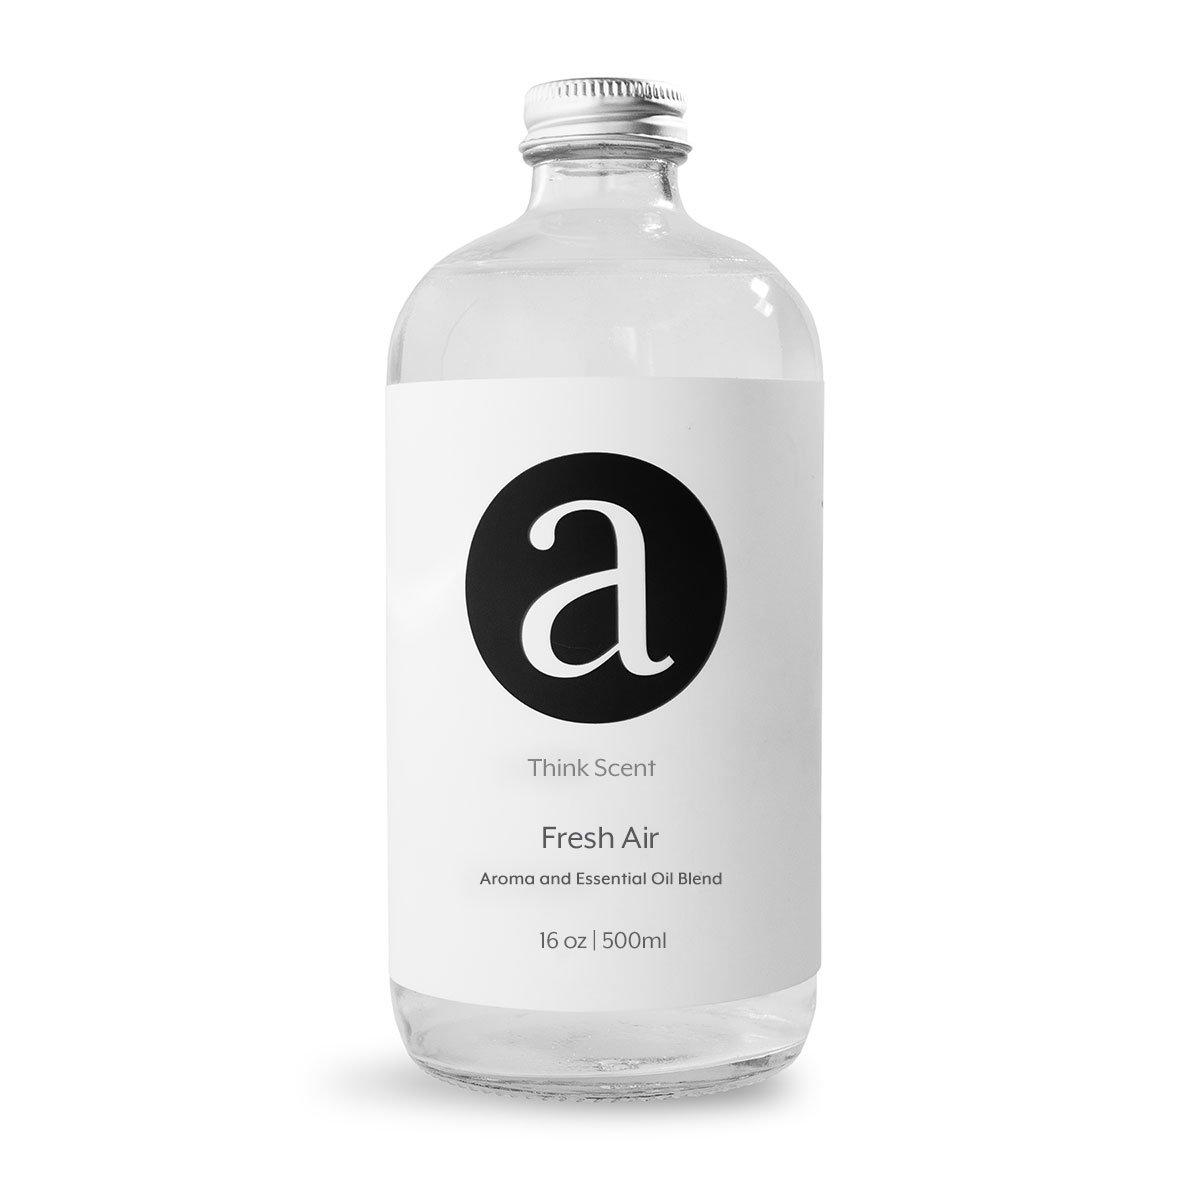 (Fresh Air) Aroma / Fragrance Oil For AromaTech Air Freshener Scent Diffuser (Half Gallon)